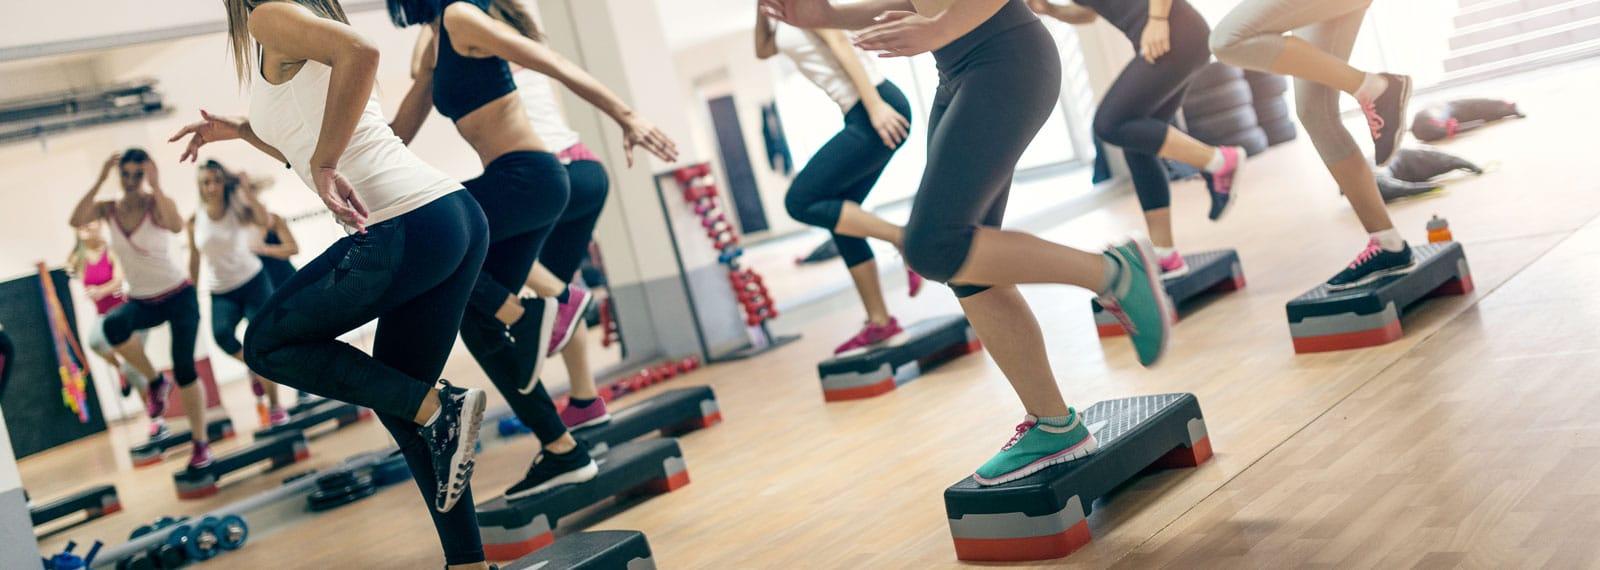 Trainingsraum-im-Fitness-Loft-1600x570px